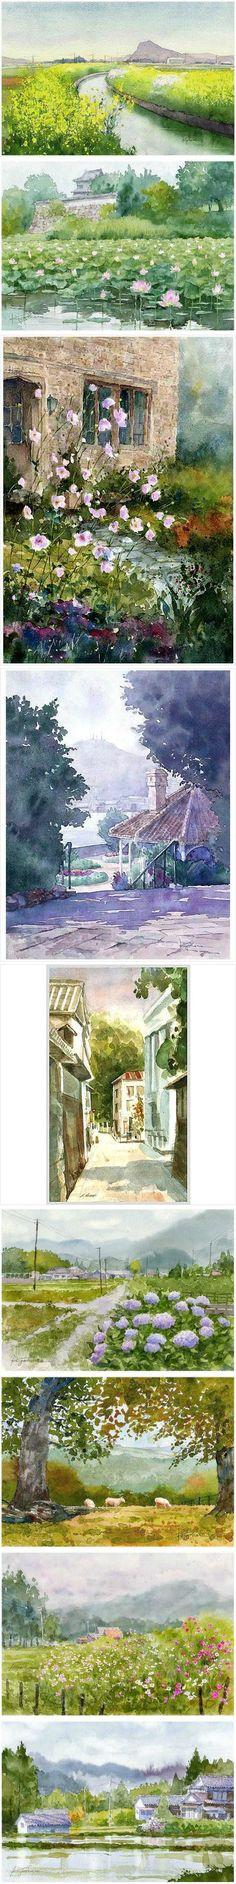 Watercolor Landscape Painting - Artist from Fukuoka, Japan, the Ballad Kawasaki Kiyoharu